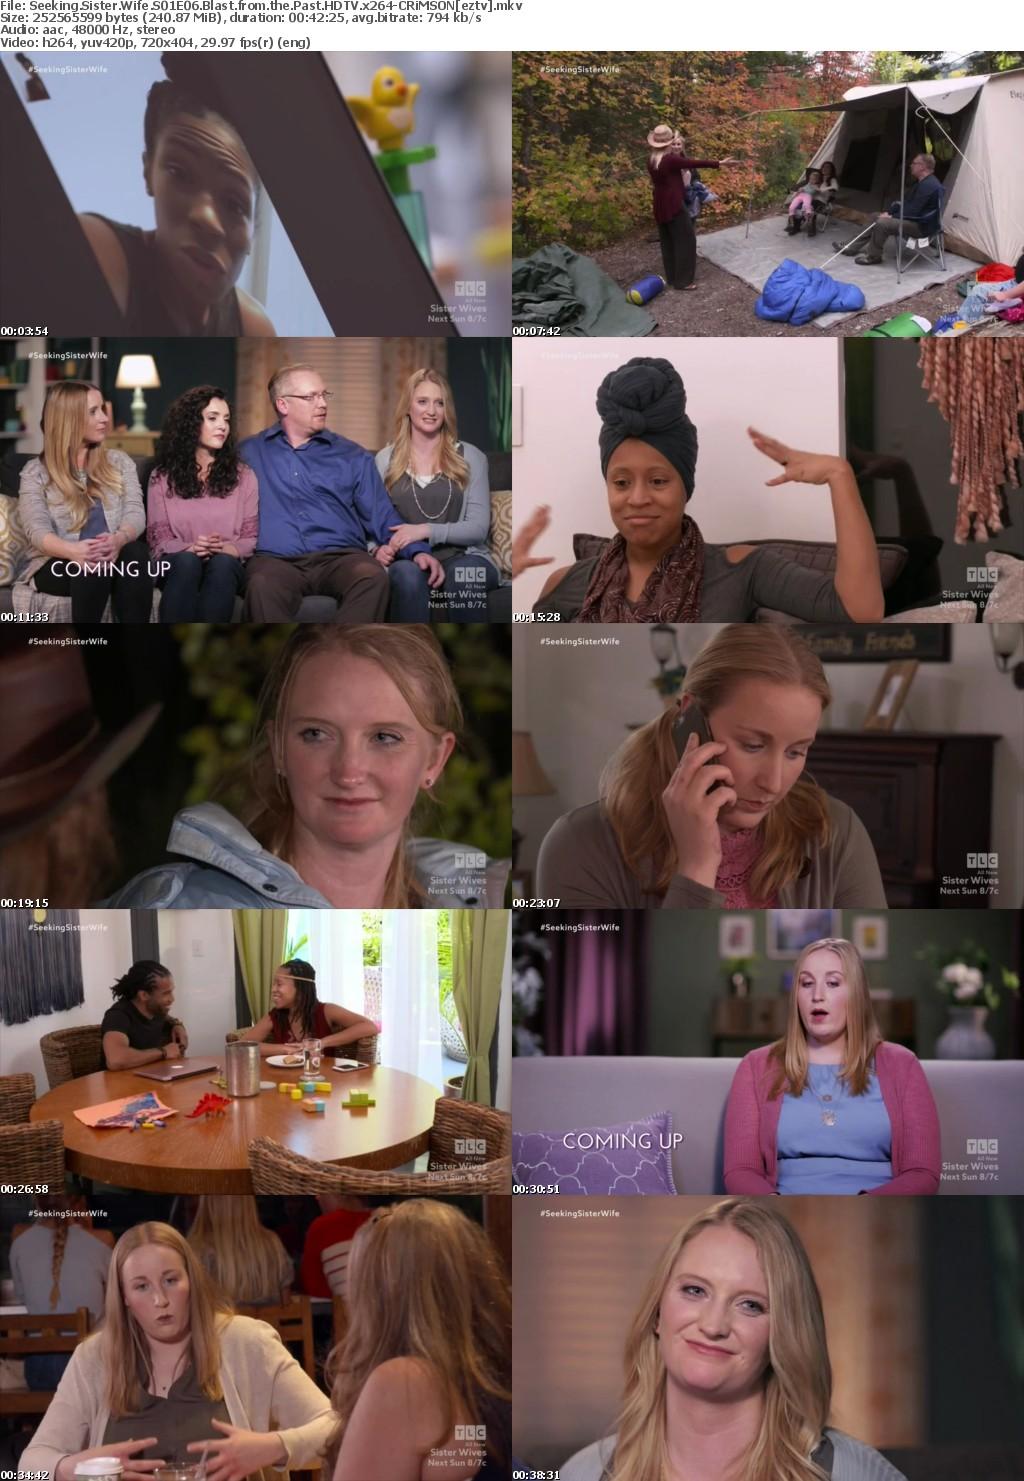 Seeking Sister Wife S01E06 Blast from the Past HDTV x264-CRiMSON